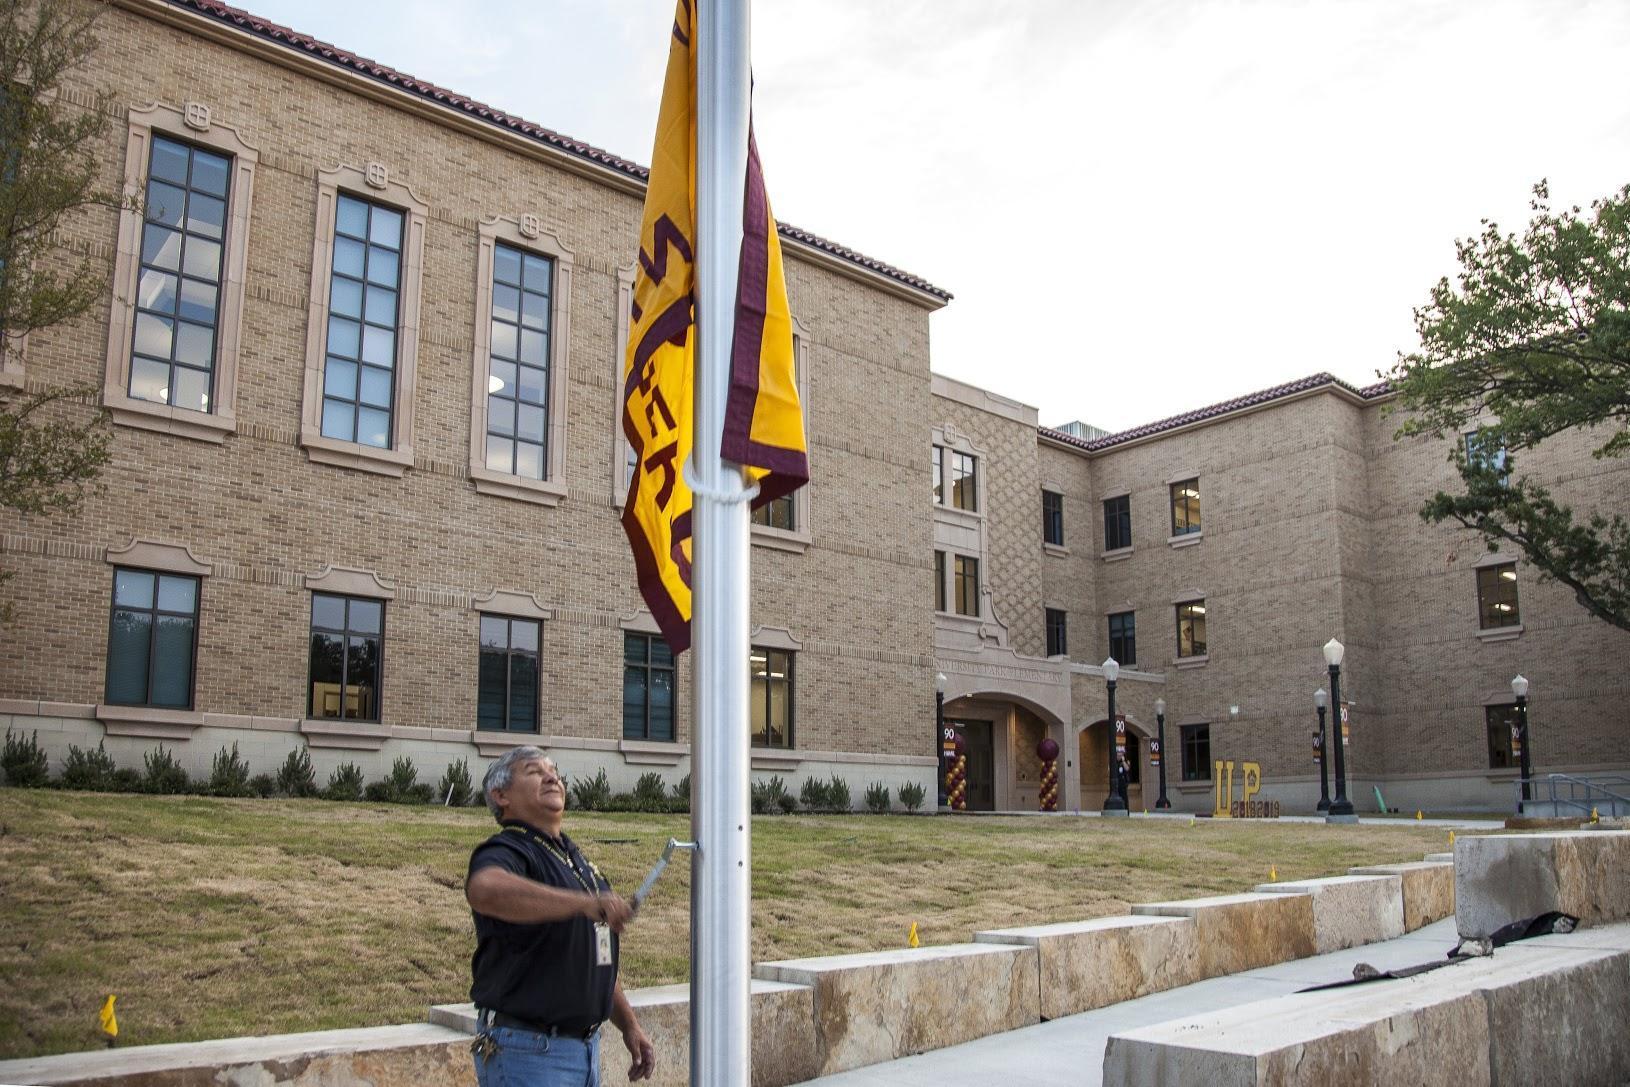 Raising the flag at University Park Elementary